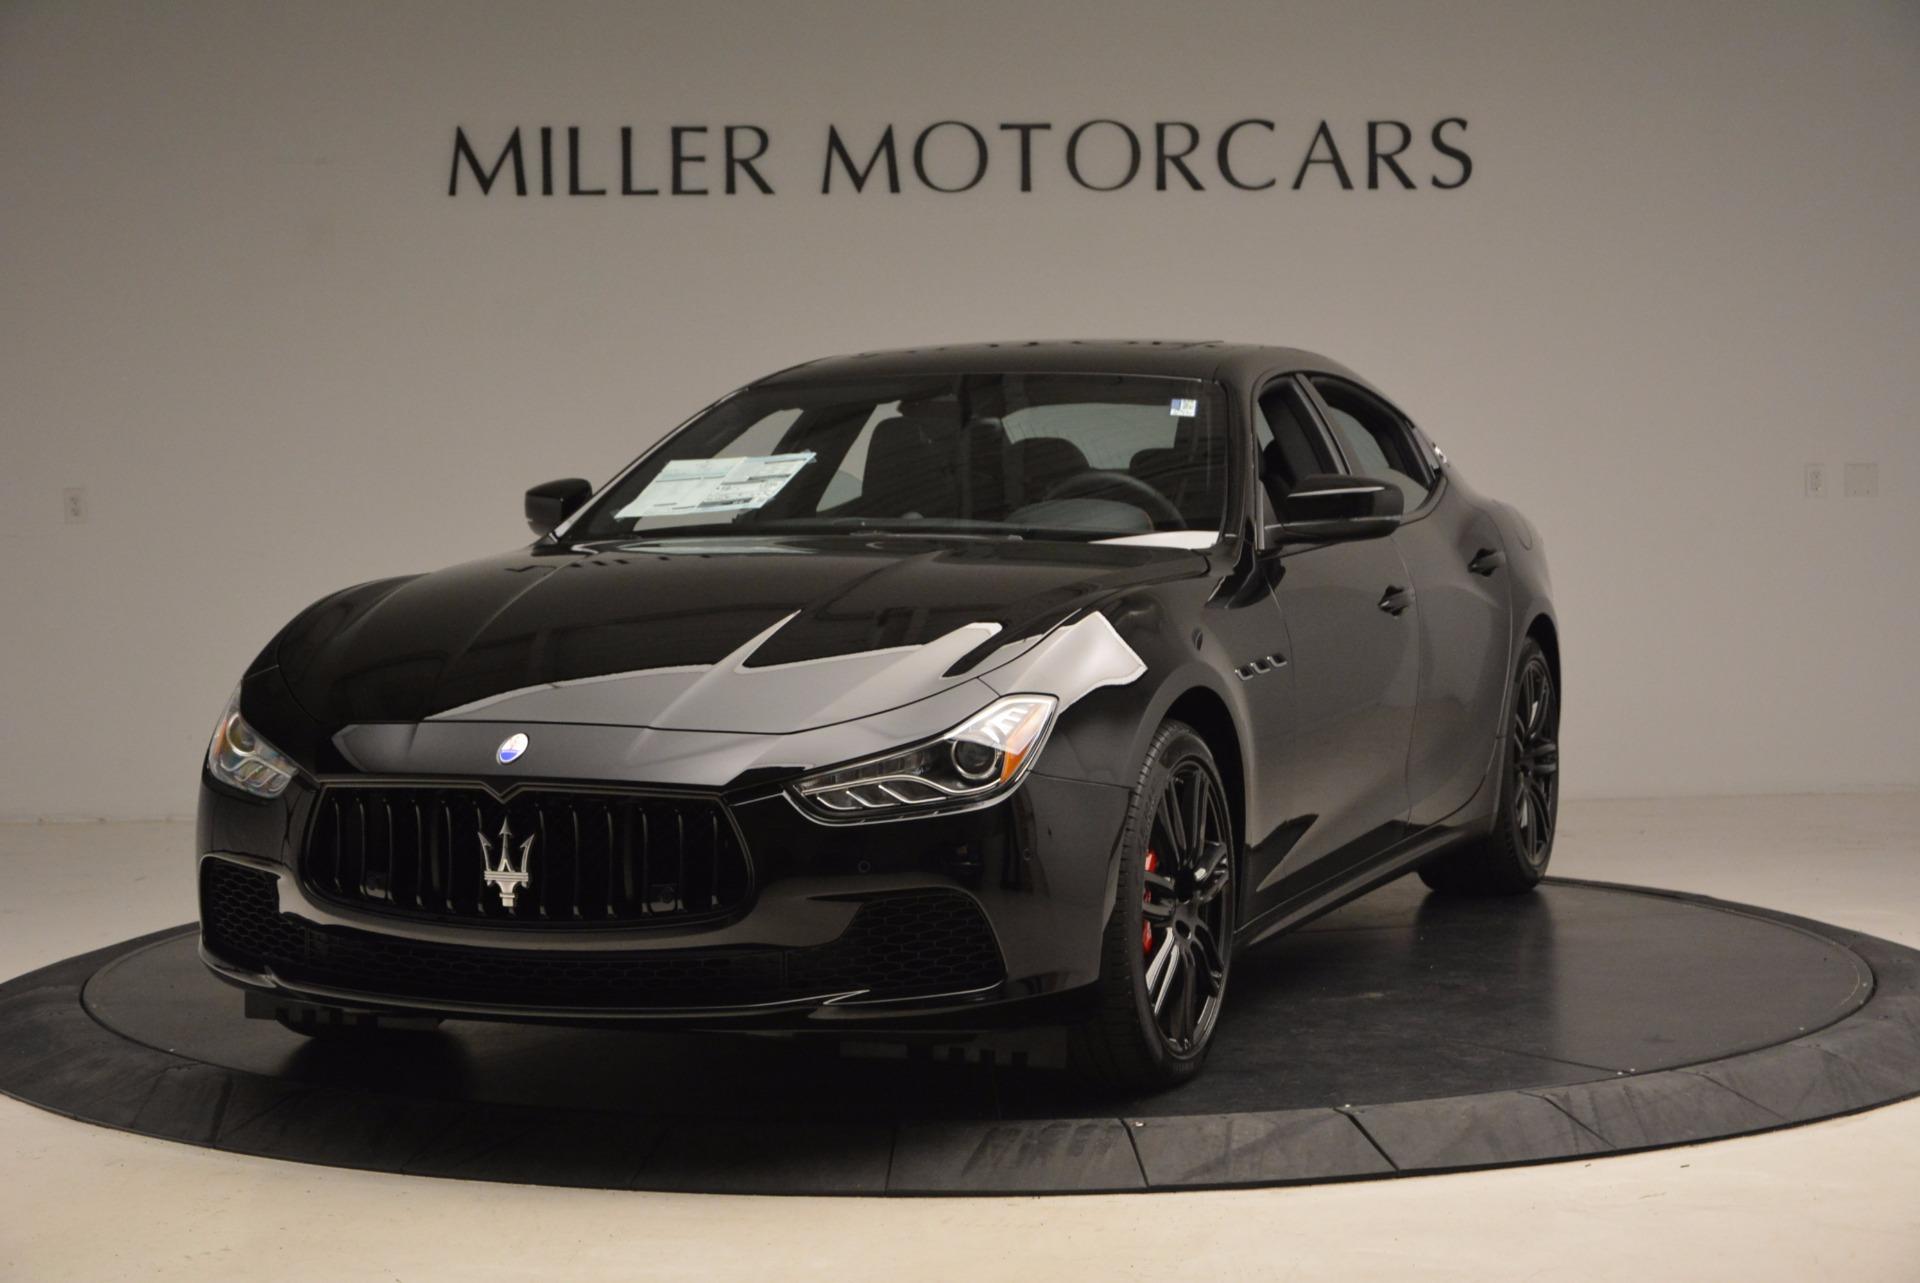 New 2017 Maserati Ghibli Nerissimo Edition S Q4 For Sale In Westport, CT 1420_main